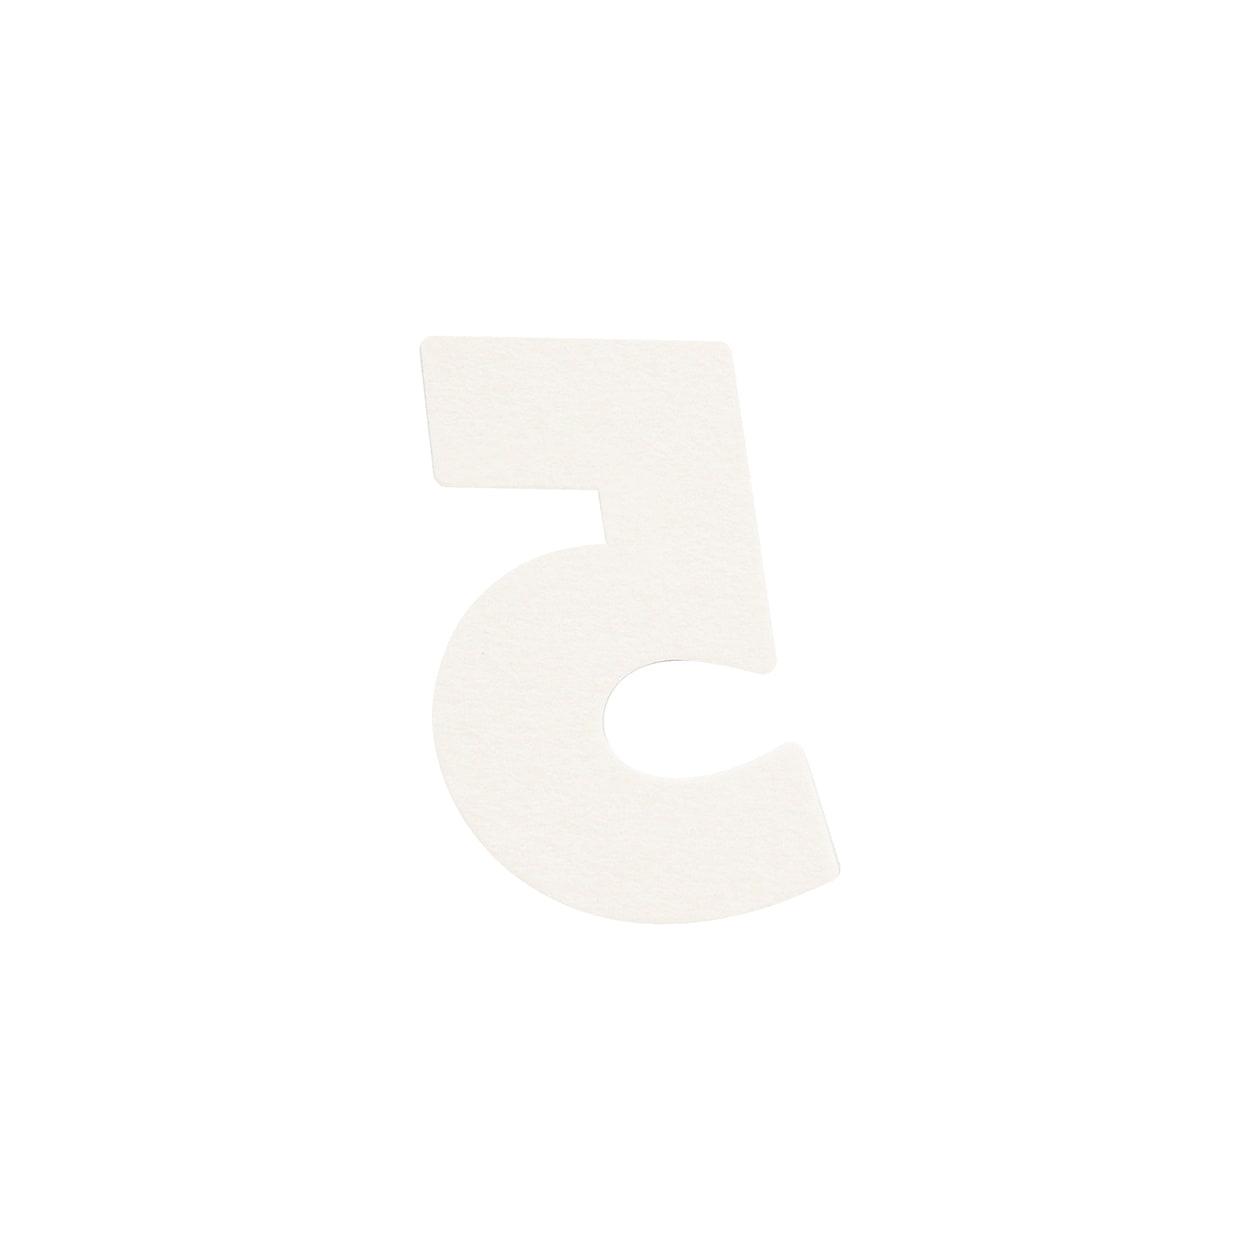 No.395ボード ネームカードDC 数字5 シルバー